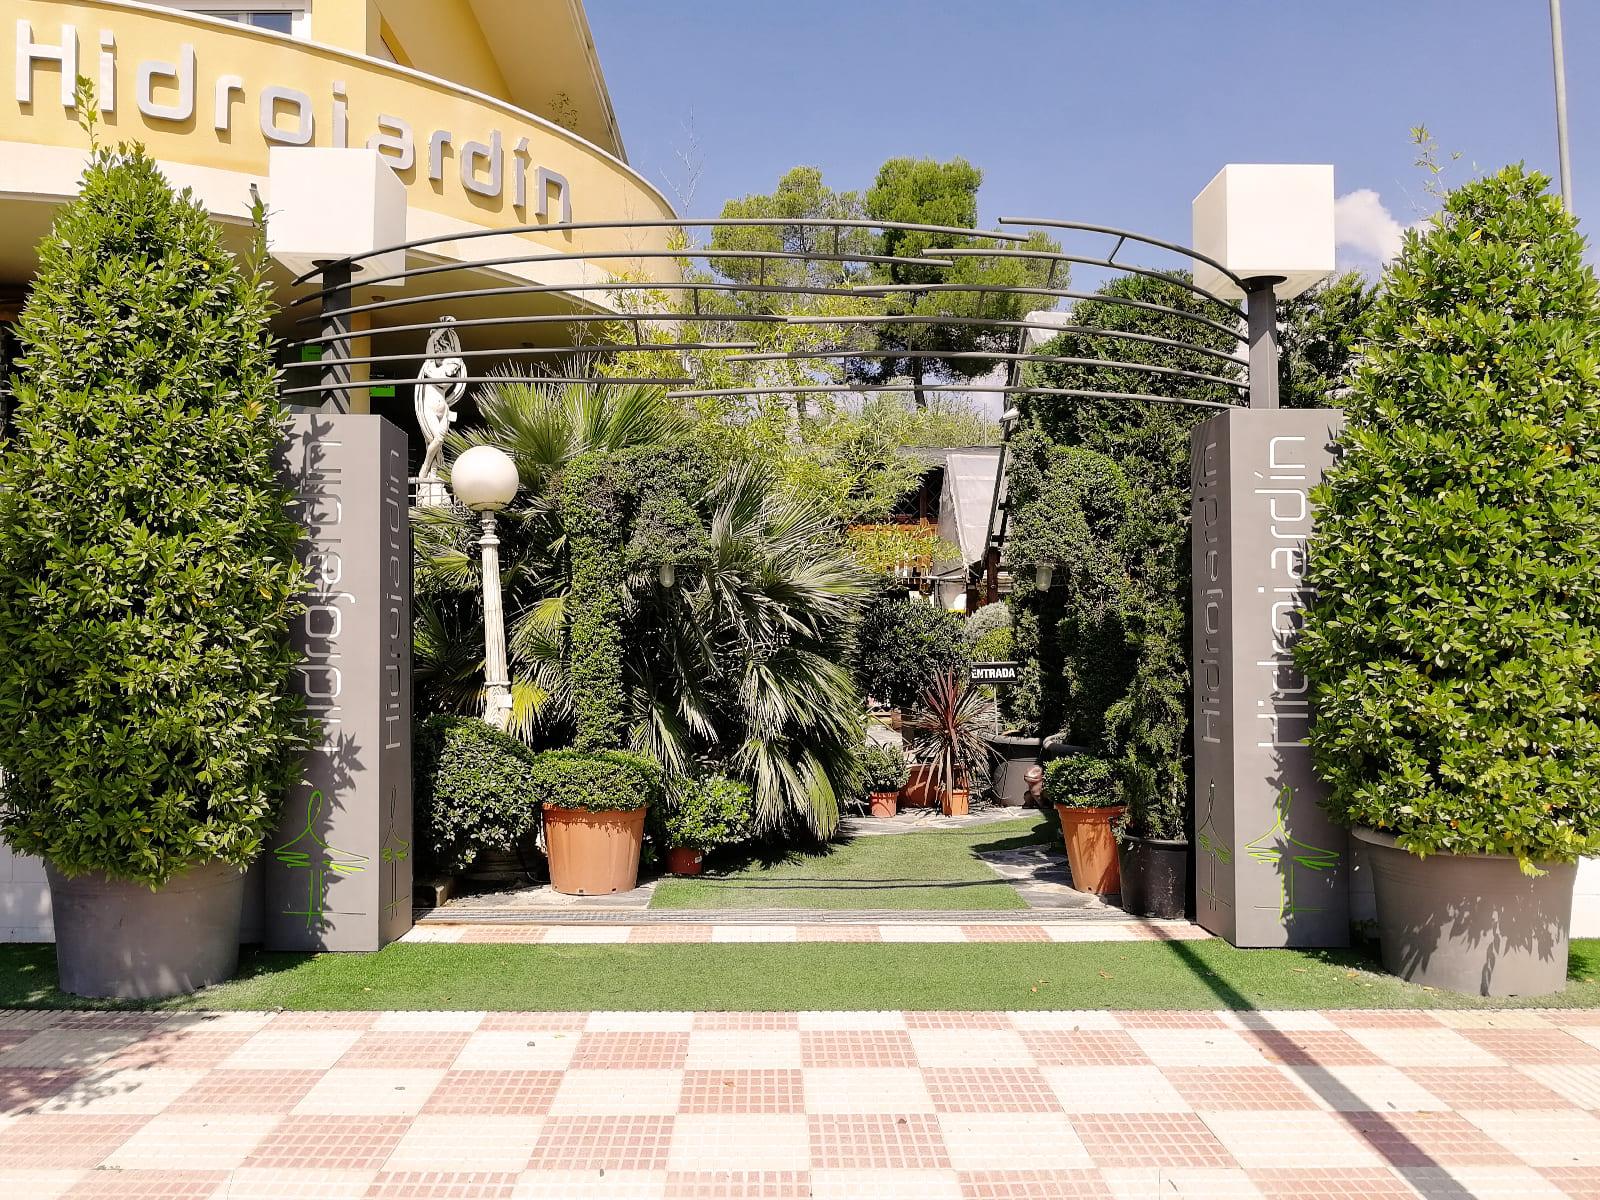 centro-jardineria-garden-invernadero-artesanal-madera-fuente-01_HIDROJARDIN-Bañeres